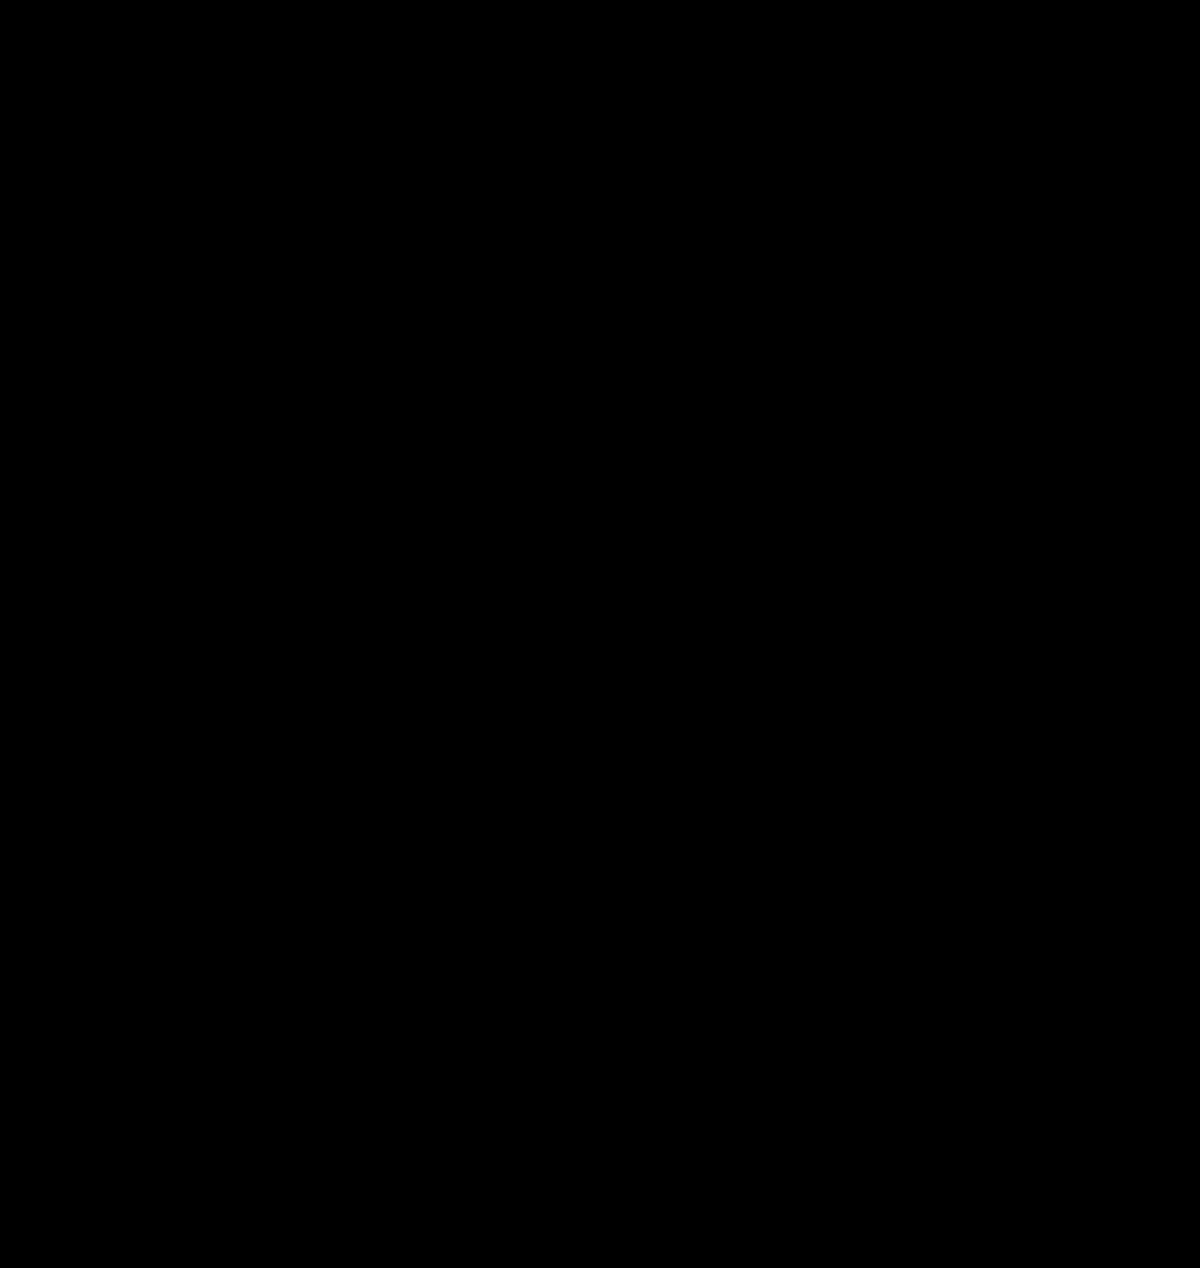 PAO Symbol - co znamená otevřený kelímek na kosmetice